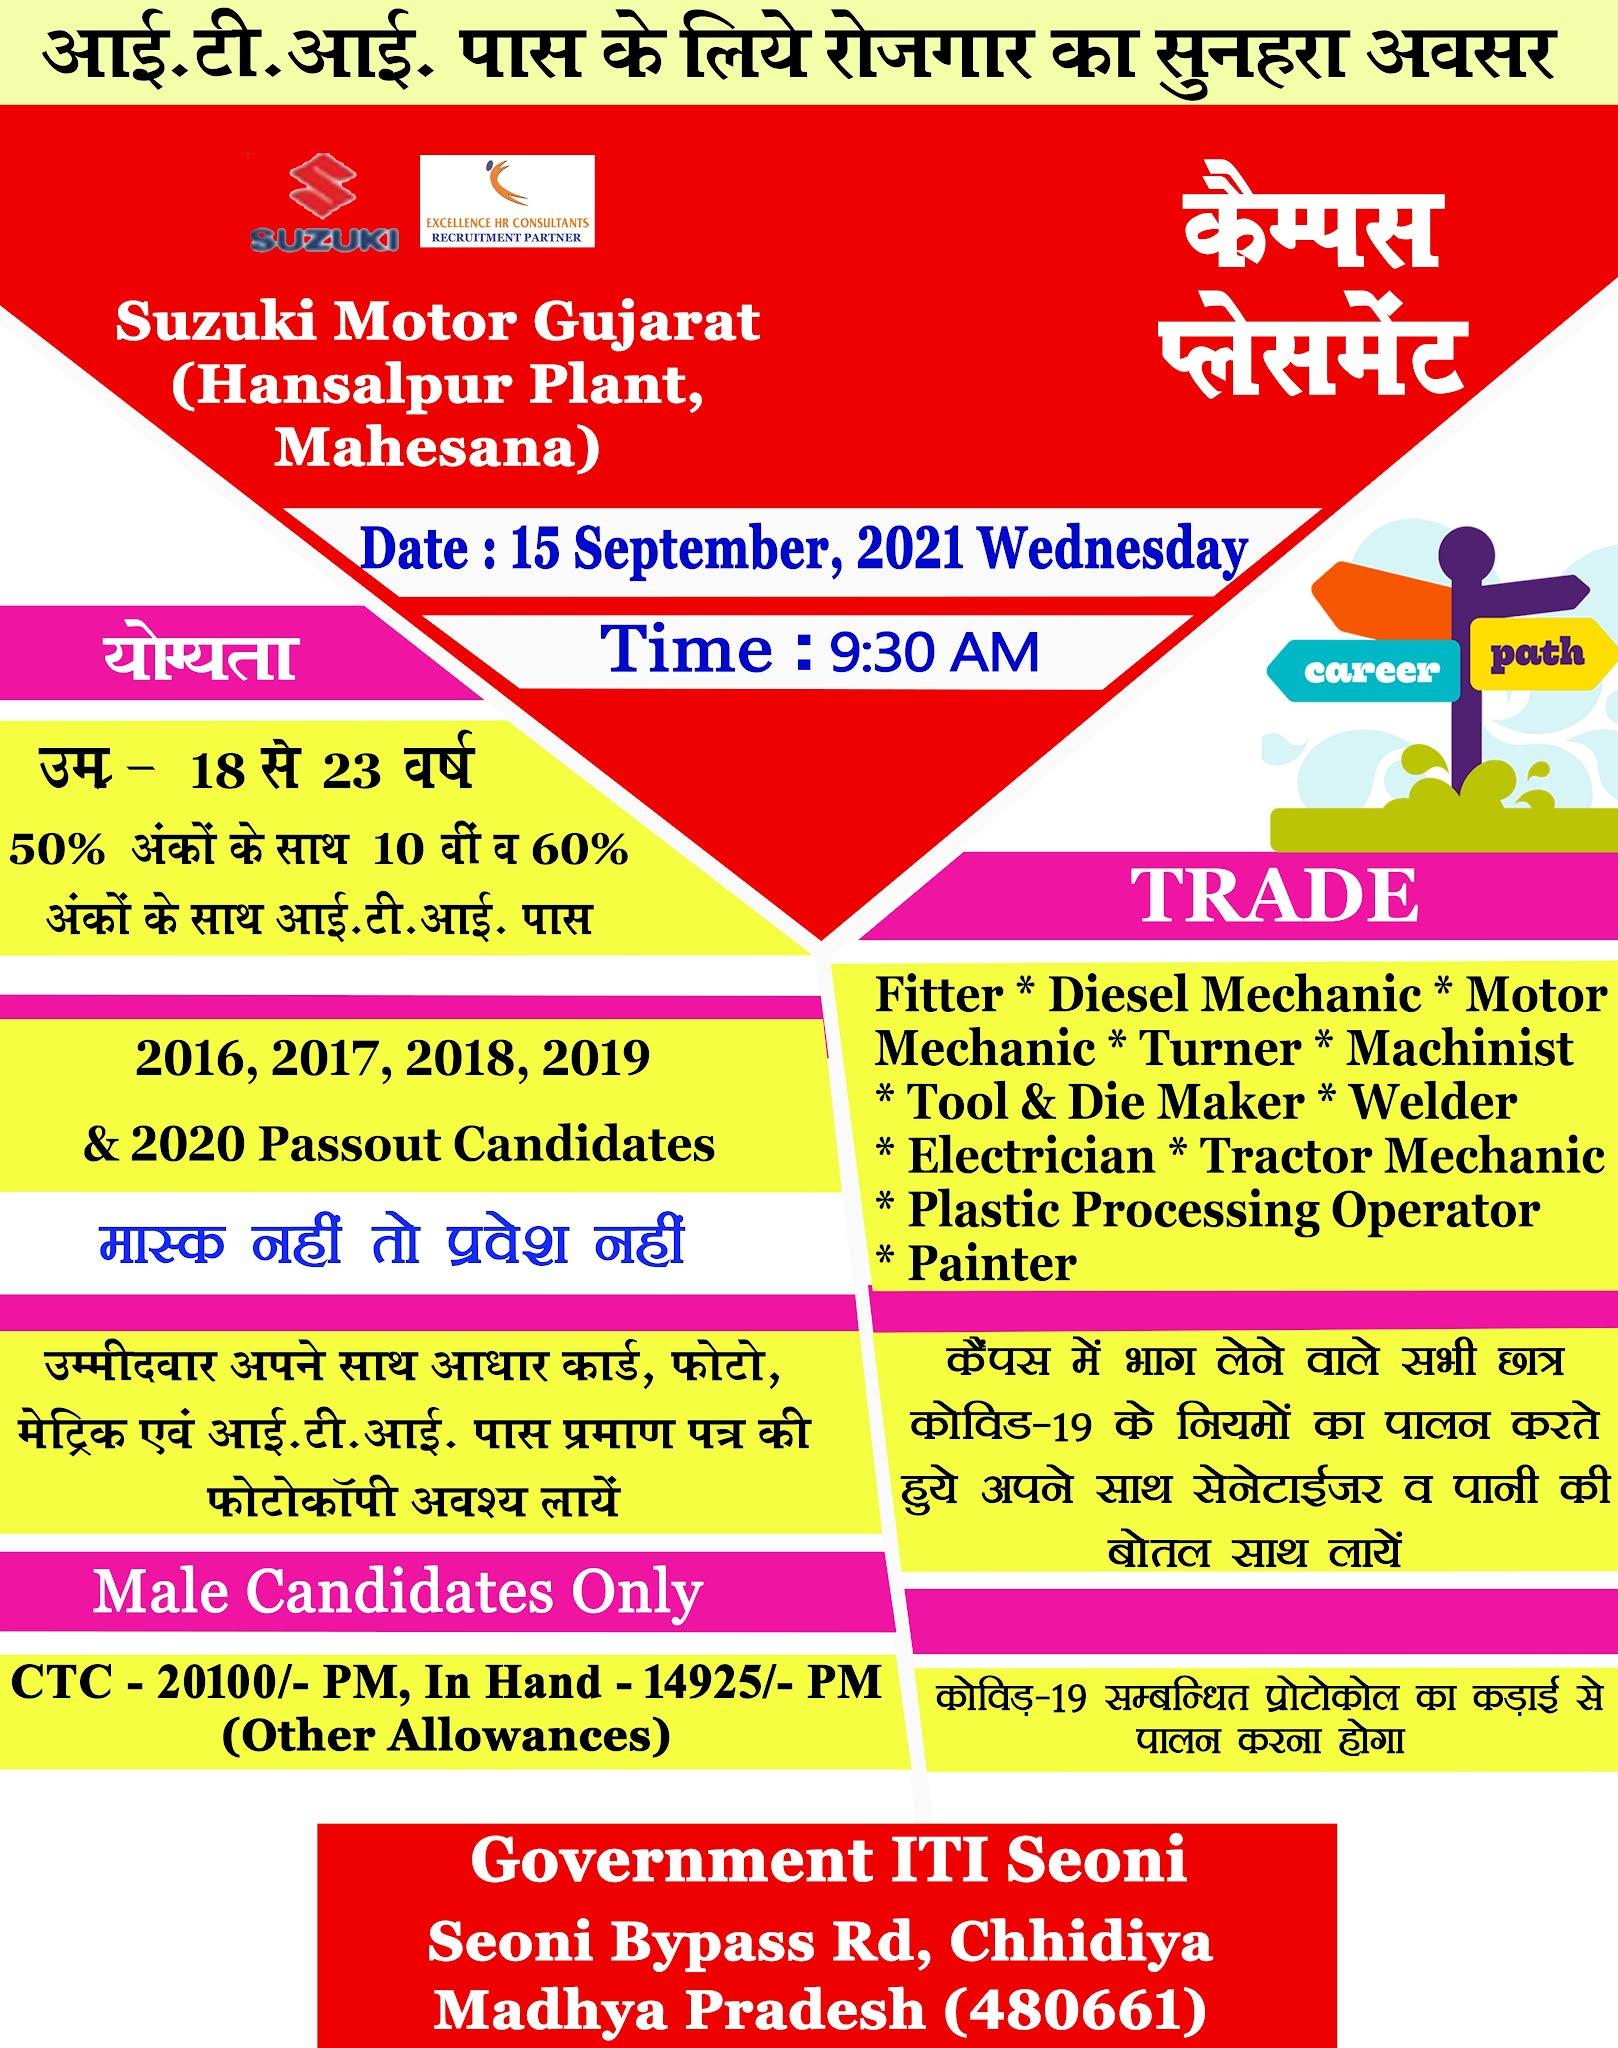 ITI Campus in Madhya Pradesh- ITI Jobs Recruitment 2021 For Suzuki Motors Cars Manufacturing Plant at Govt ITI Seoni   Govt ITI Mandla   Arihant Pvt ITI Balaghat